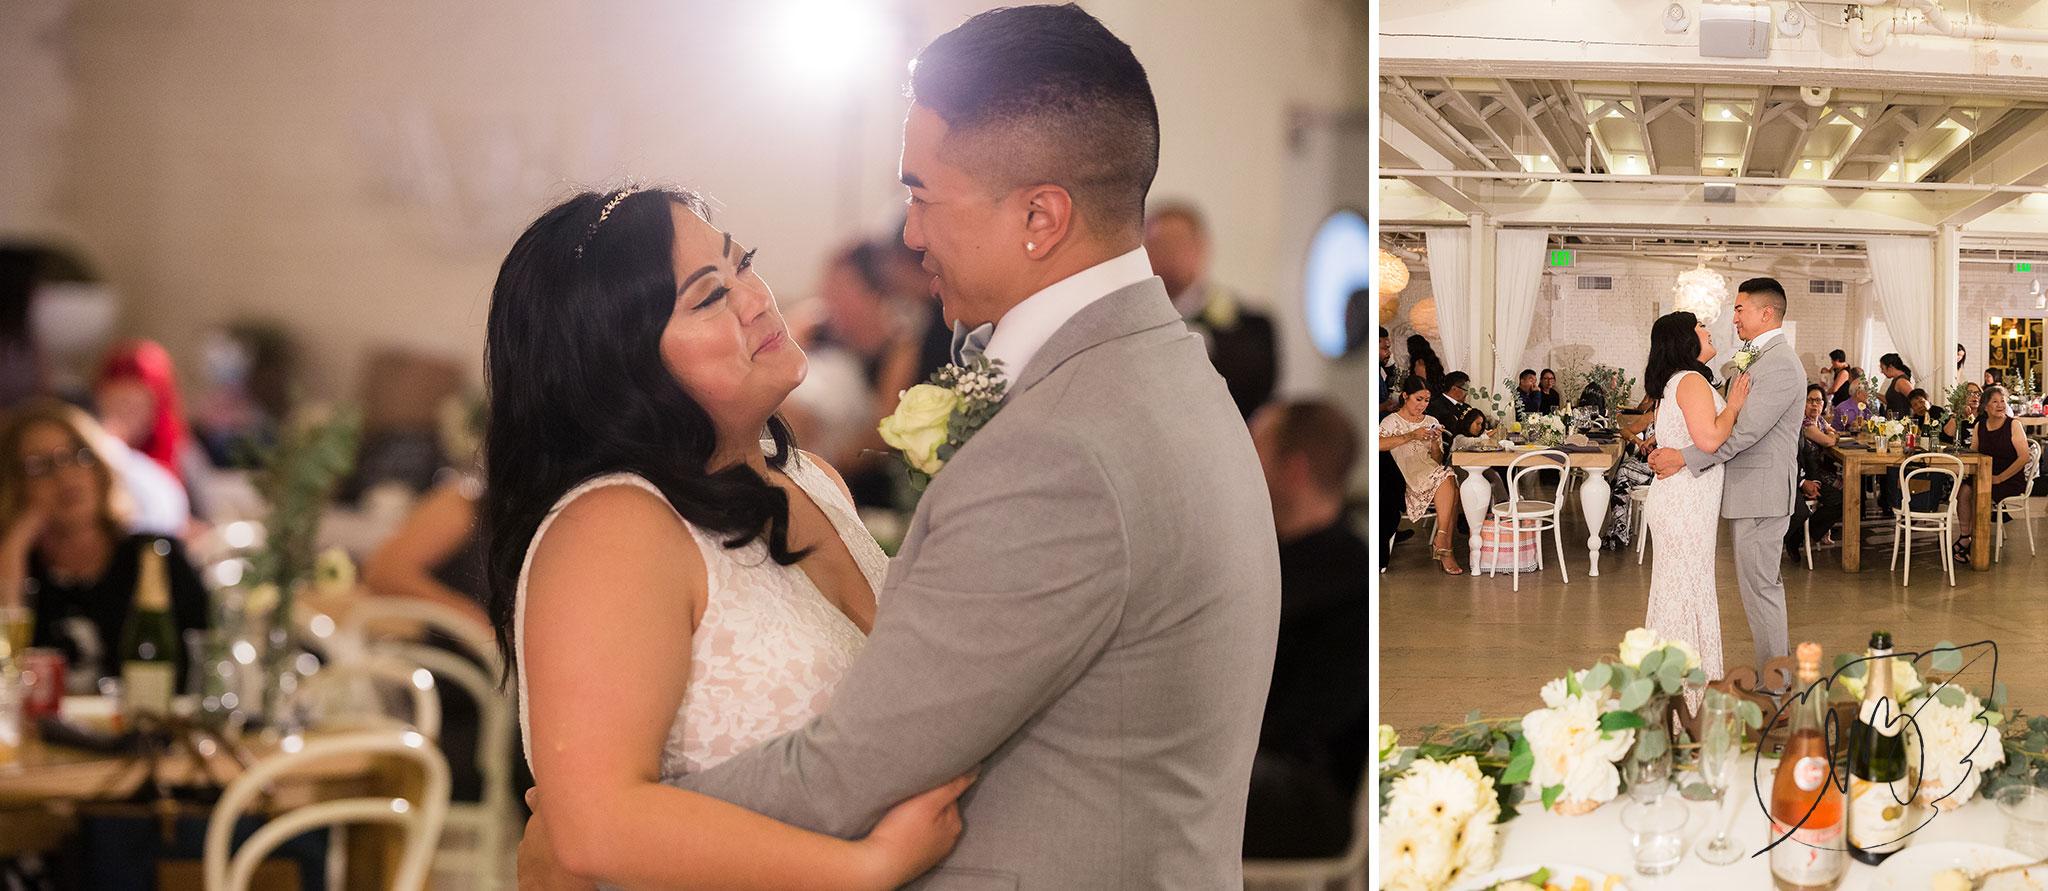 California_Orange_County_Wedding_Photographer_34.jpg